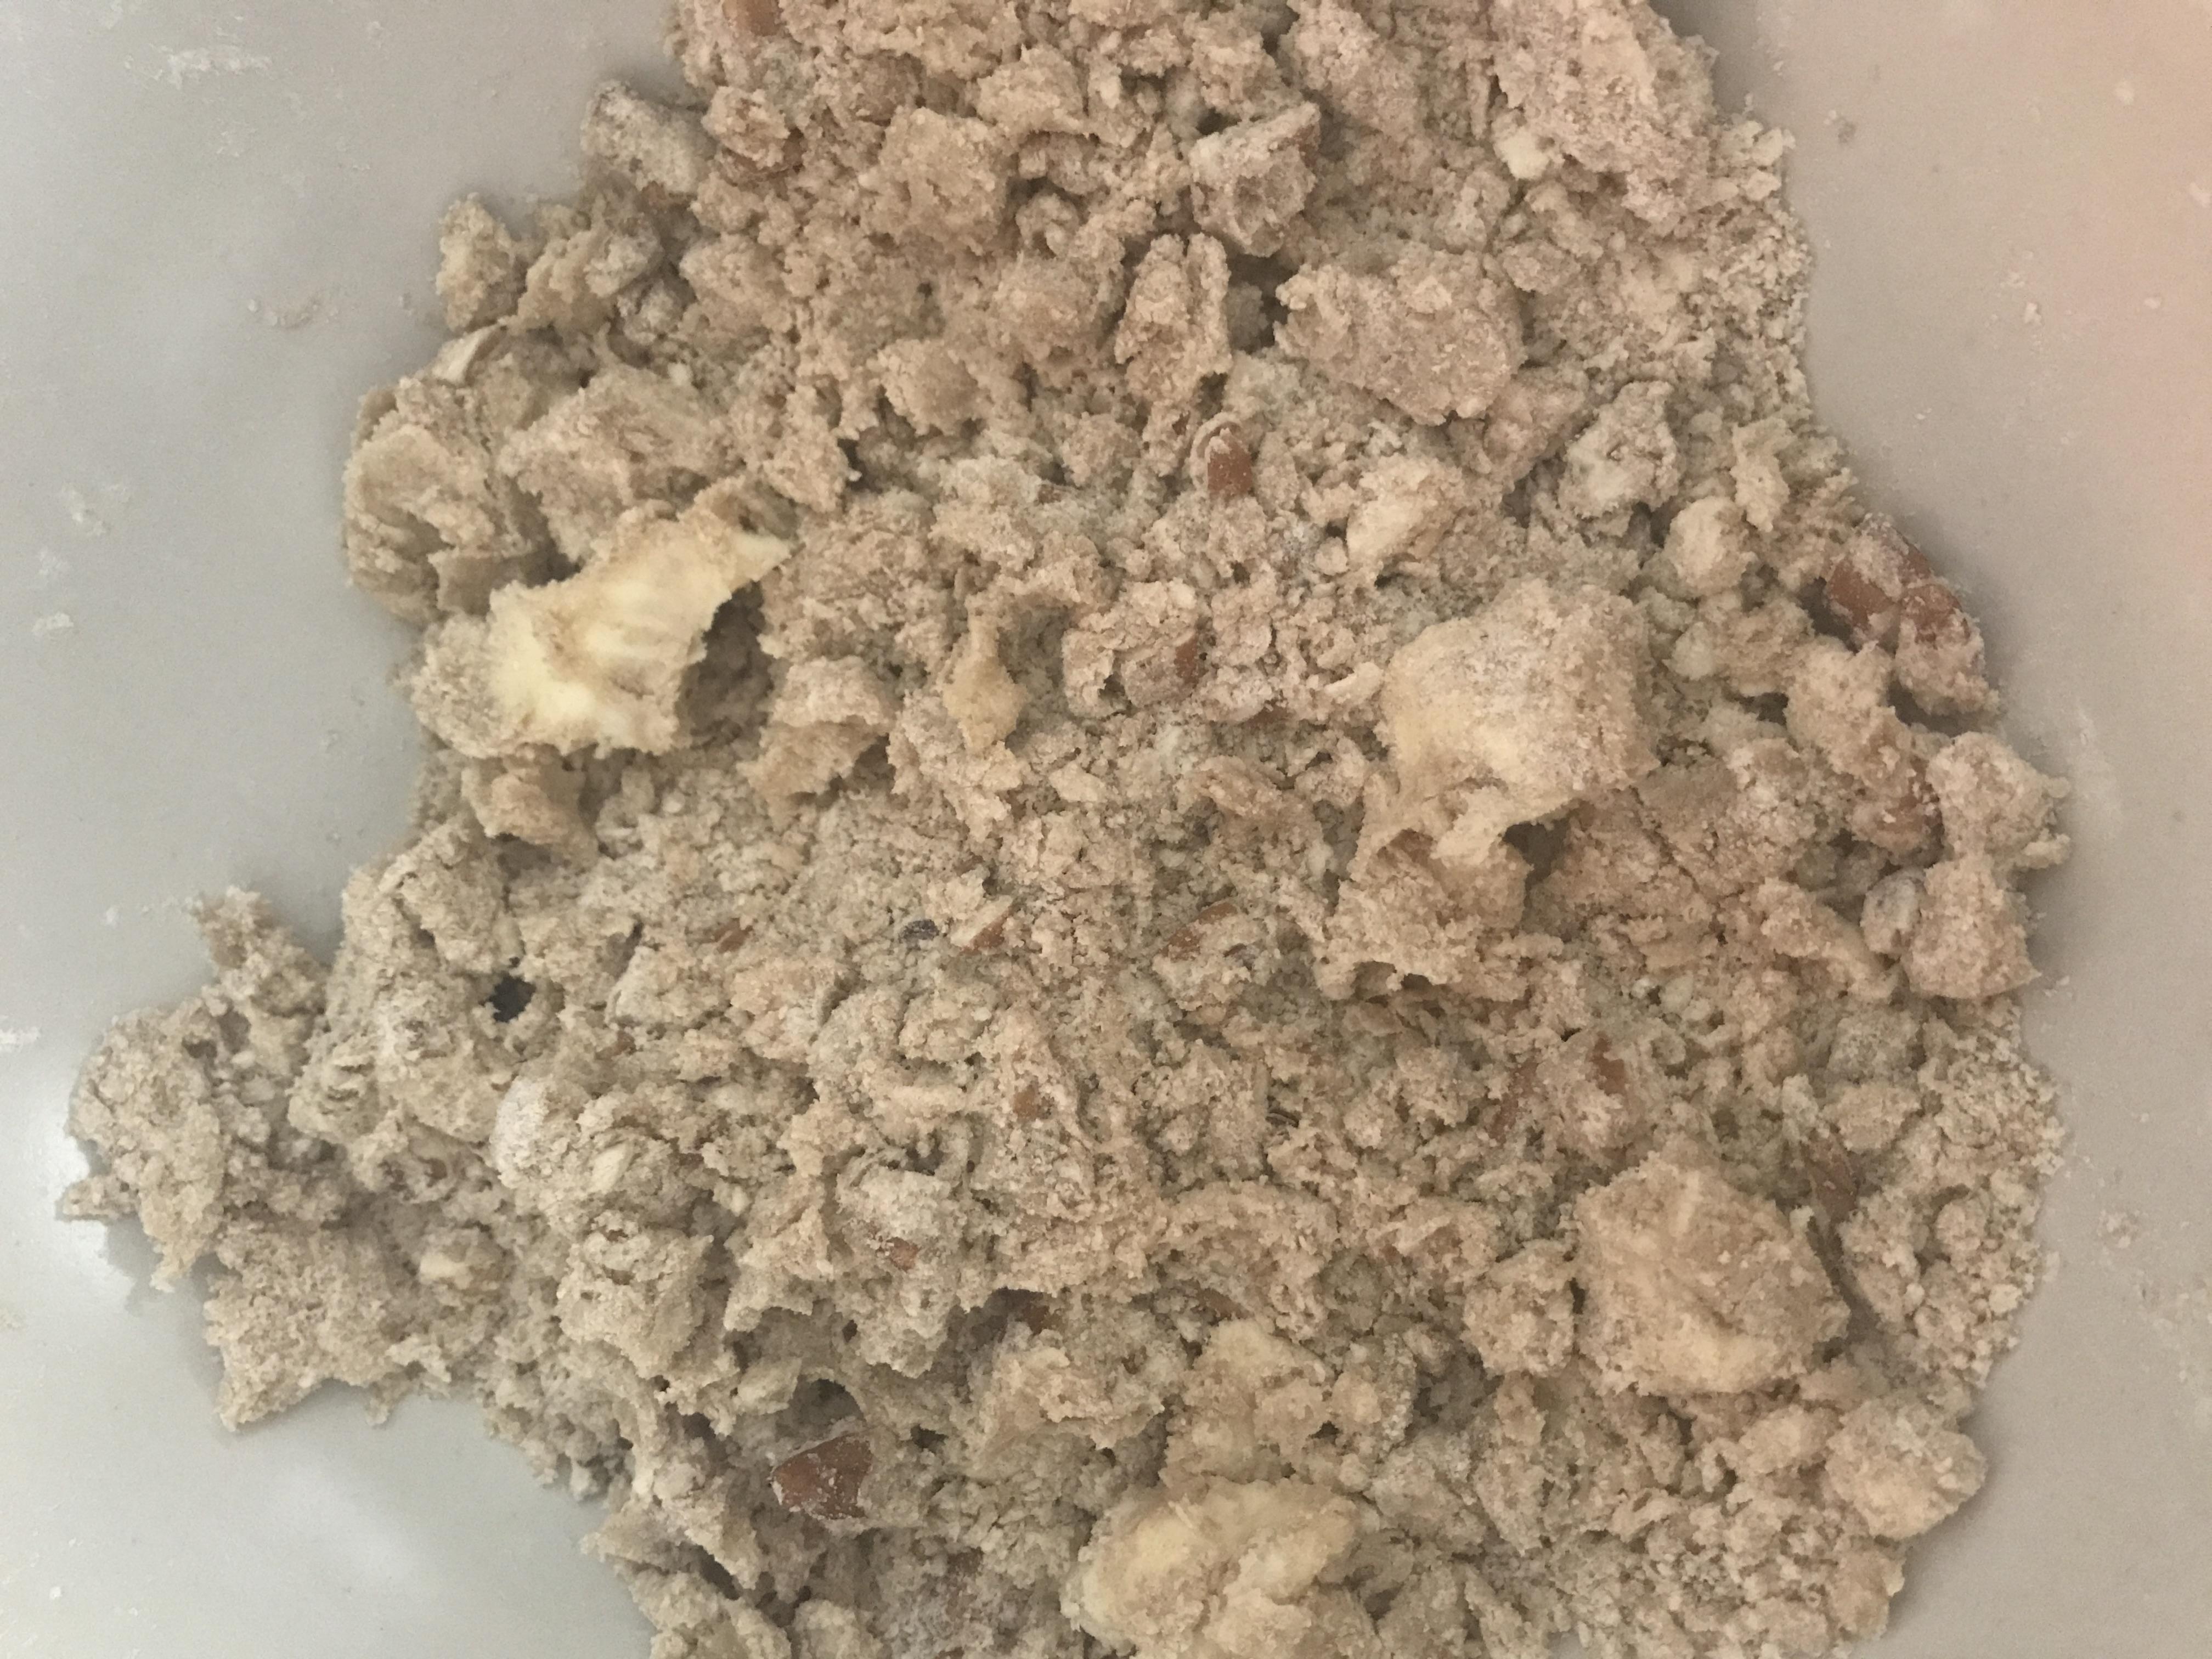 Combining ingredients for brown sugar shortbread cookies